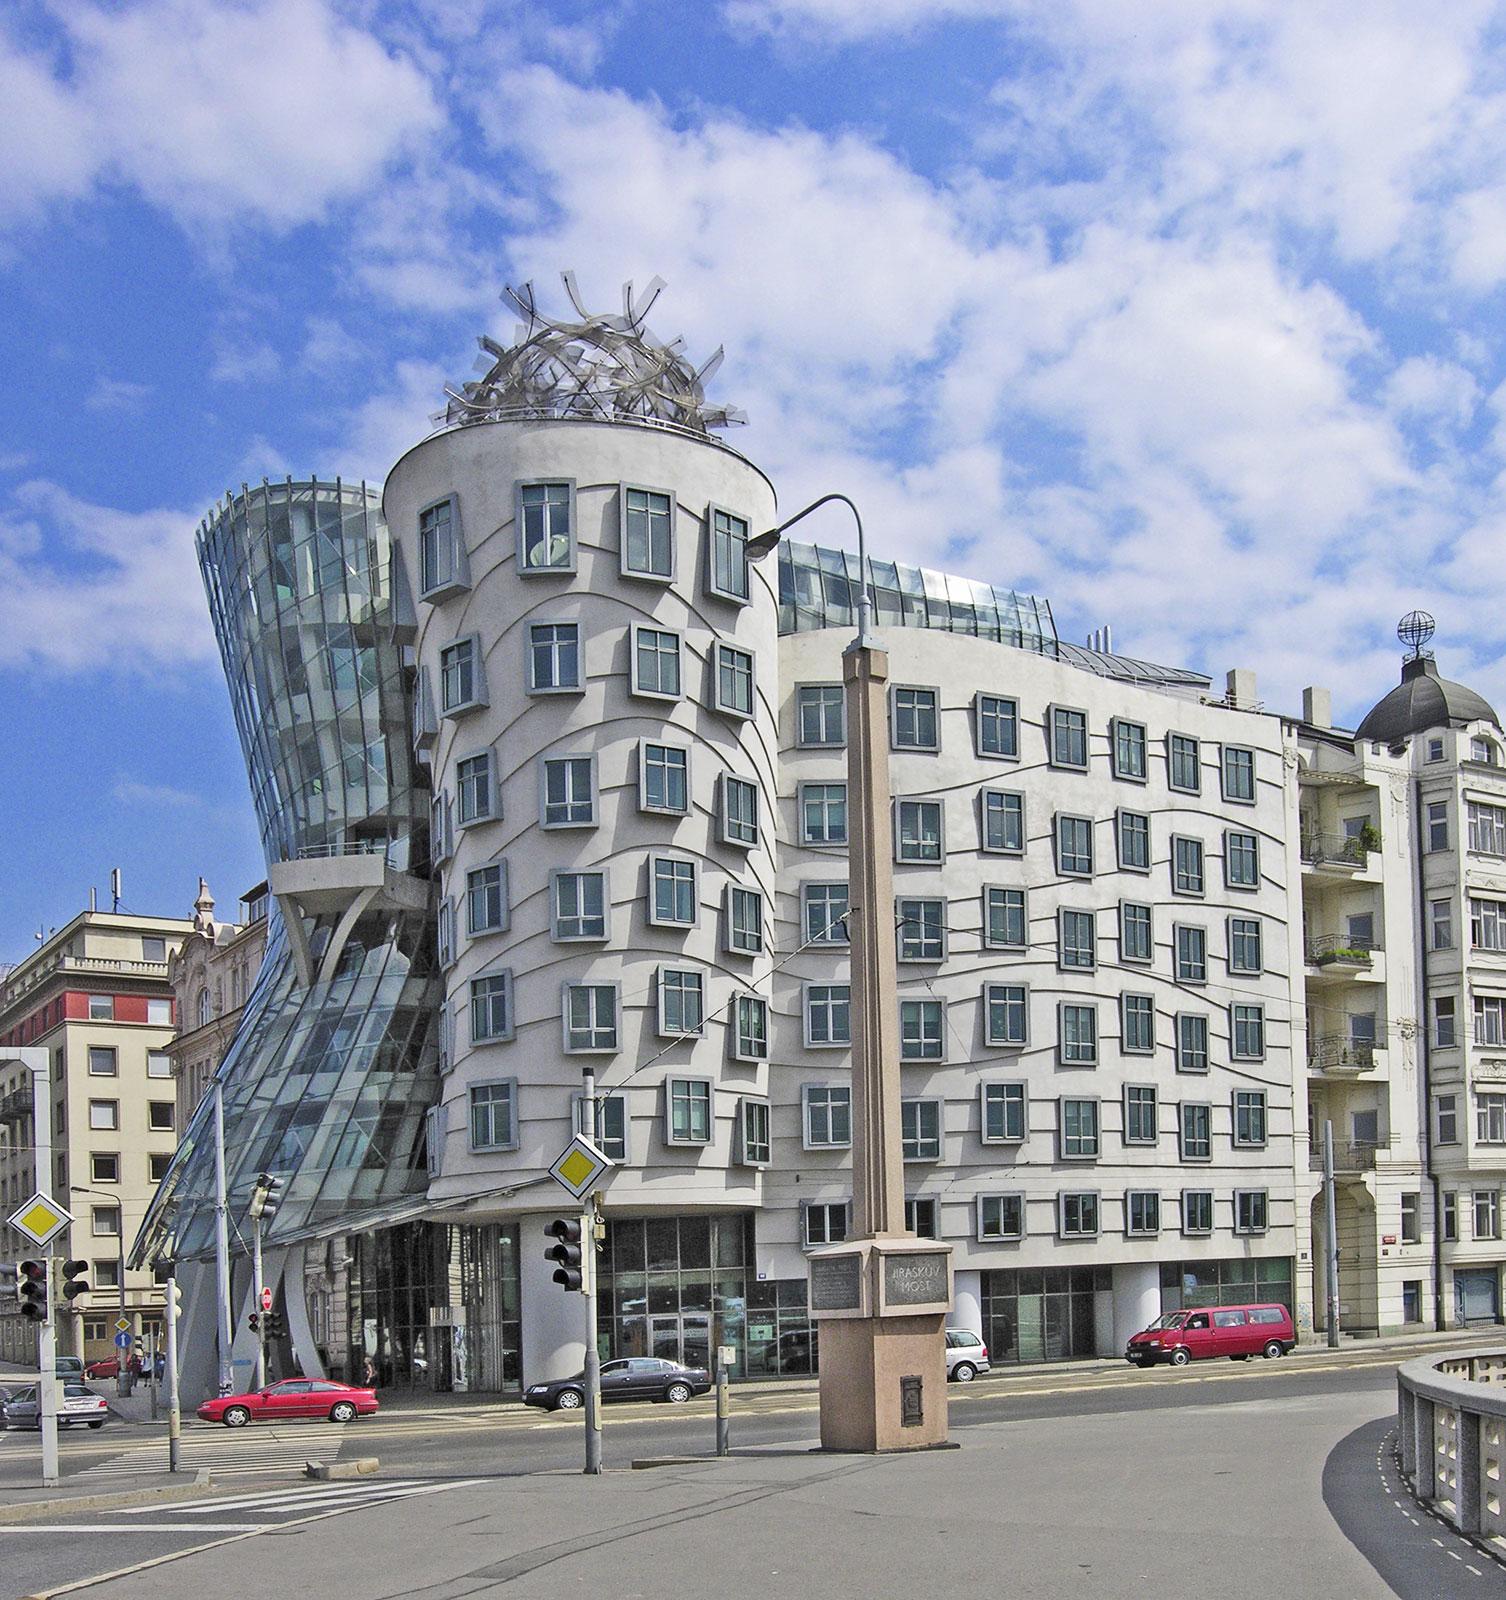 Titanic Hotel Berlin Chaubeestrabe